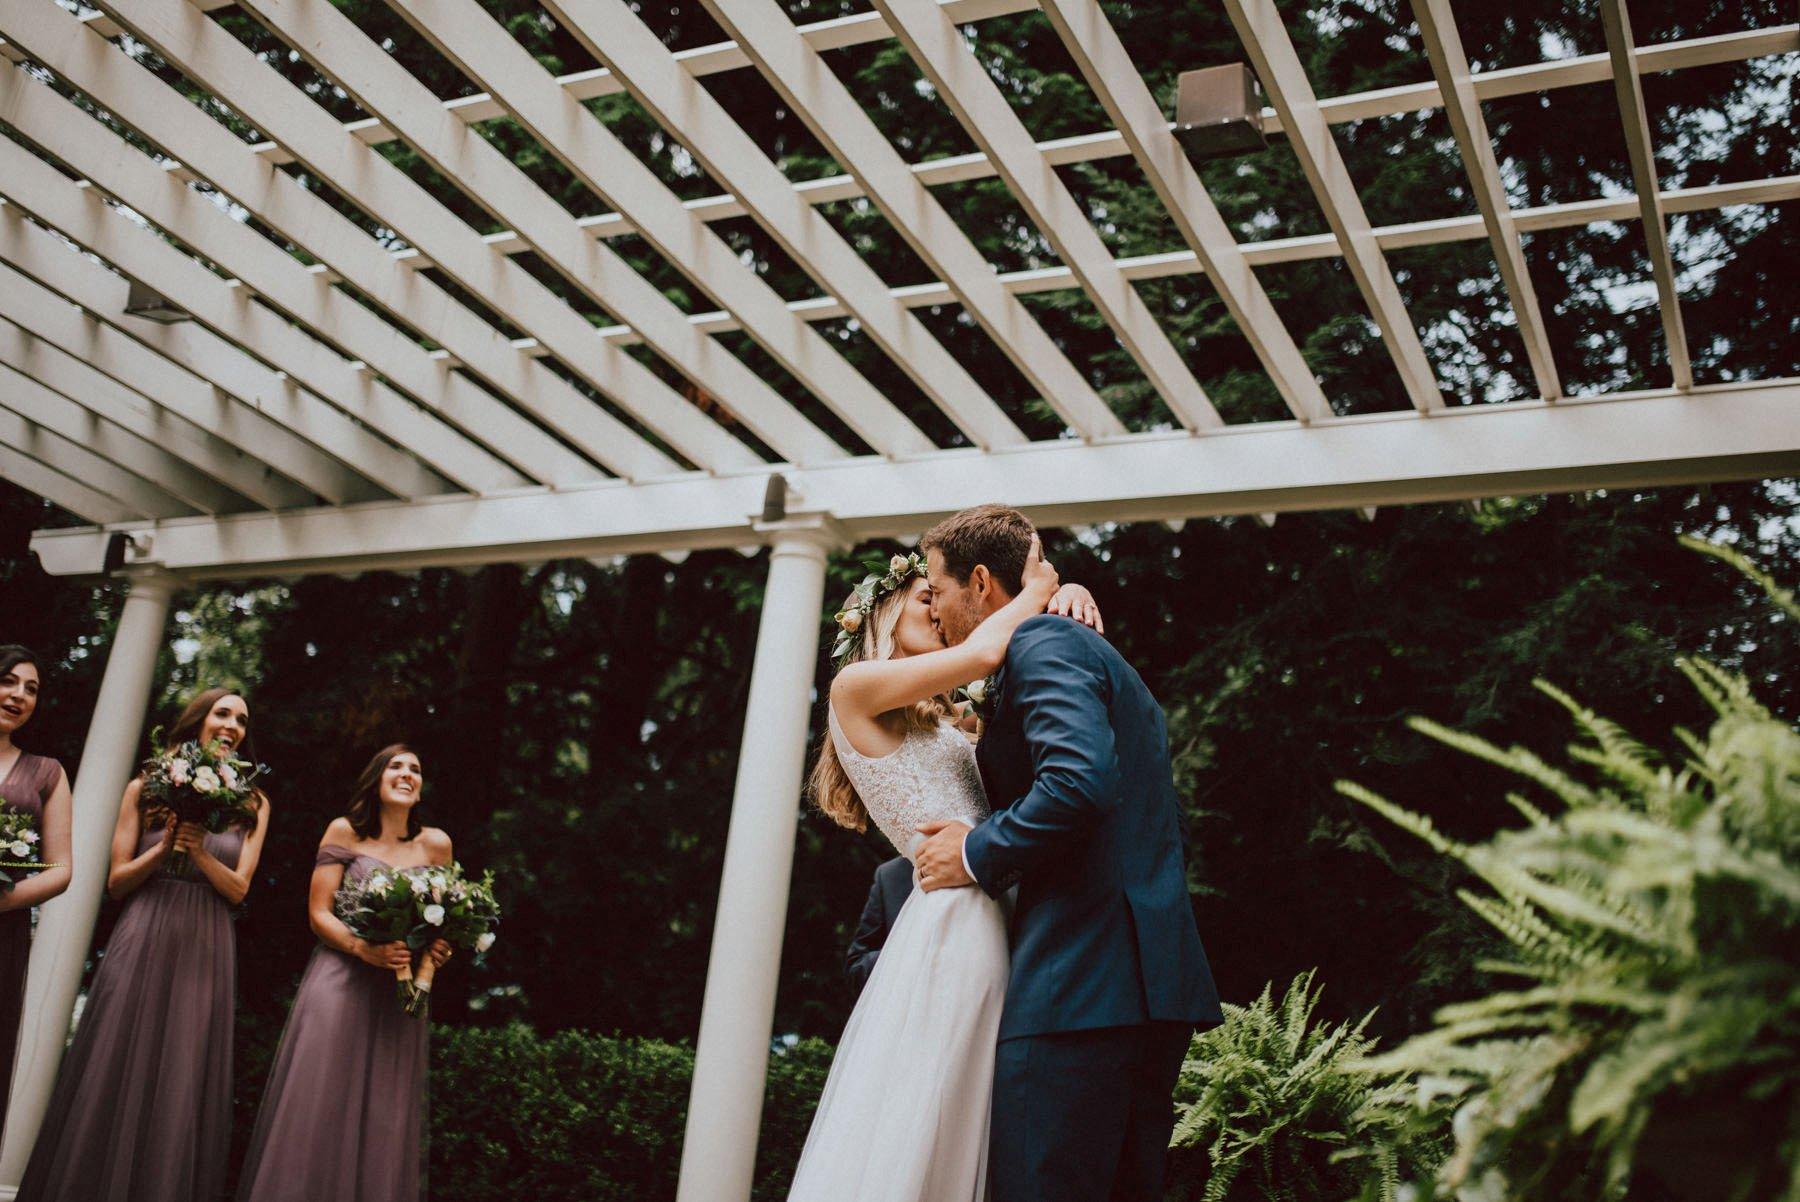 Knowlton-mansion-wedding-100.jpg